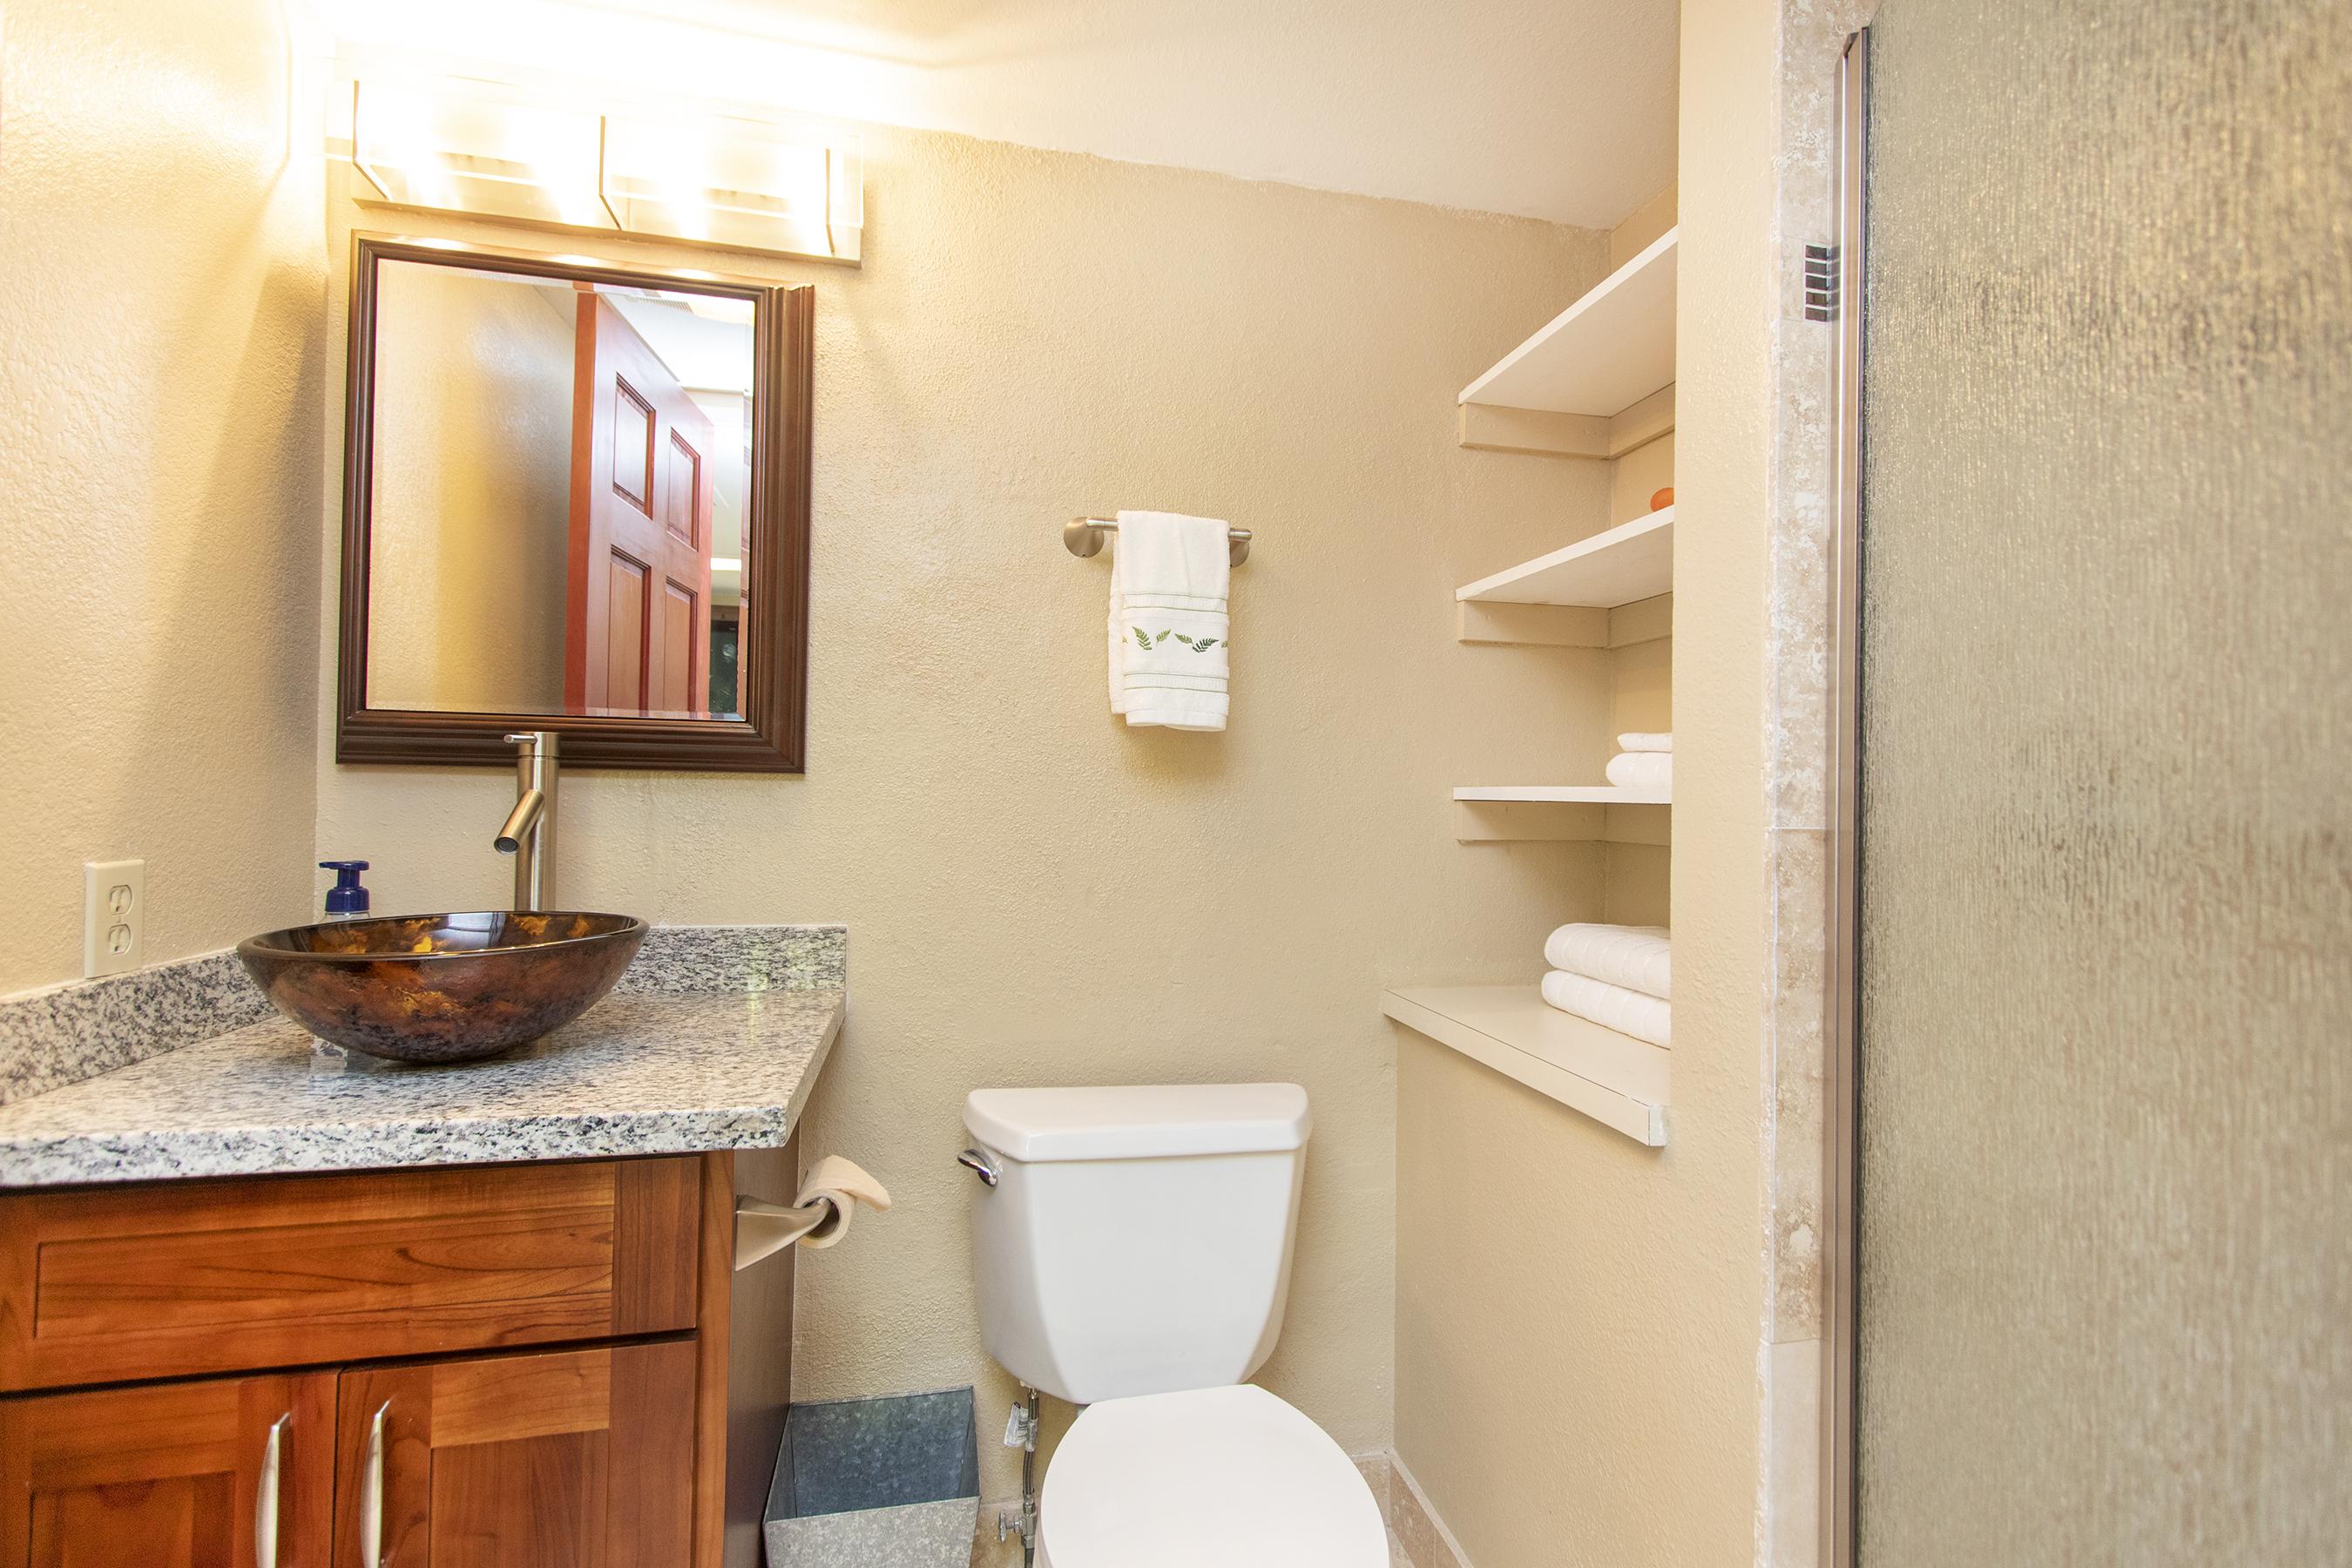 Downstairs bathroom at 3663 Woodlawn Drive